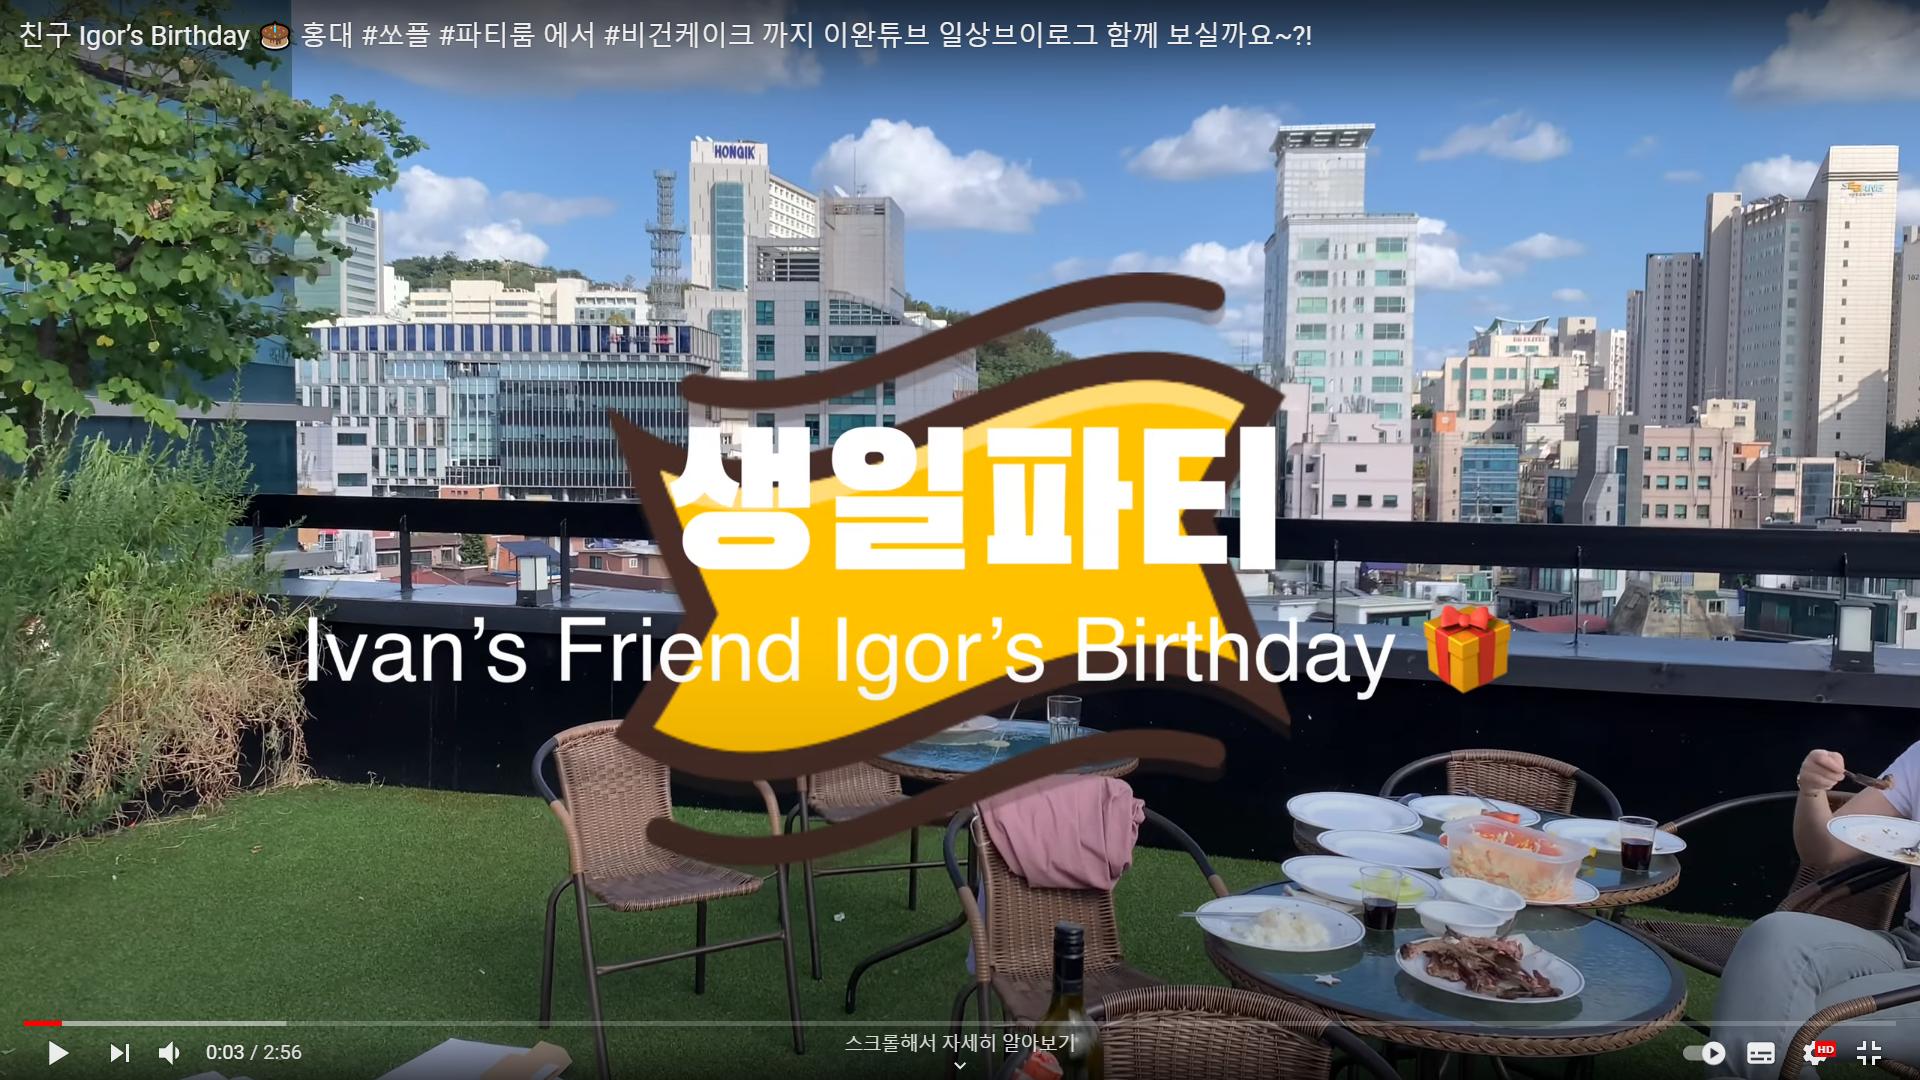 <b>쏘플 동영상 보러가기 ▶▶▶</b>